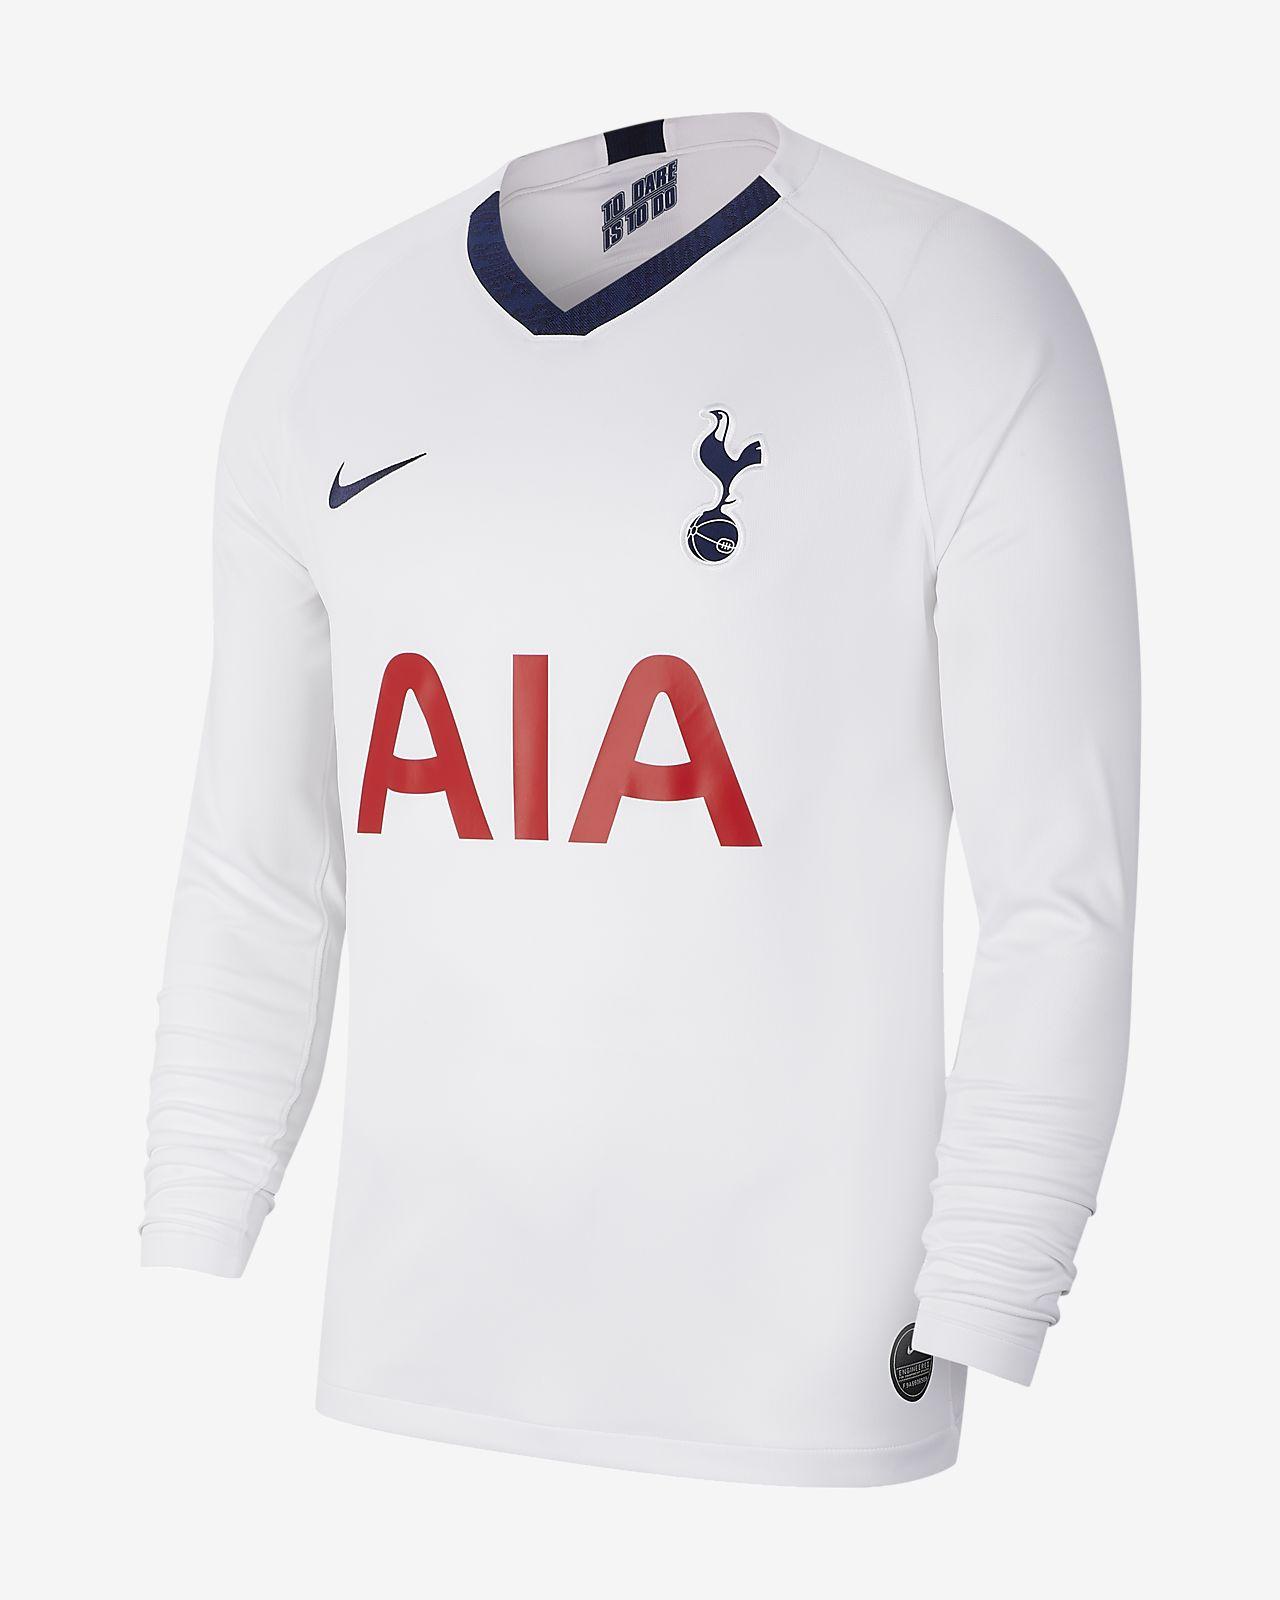 Pánský fotbalový dres s dlouhým rukávem Tottenham Hotspur 2019/20 Stadium Home